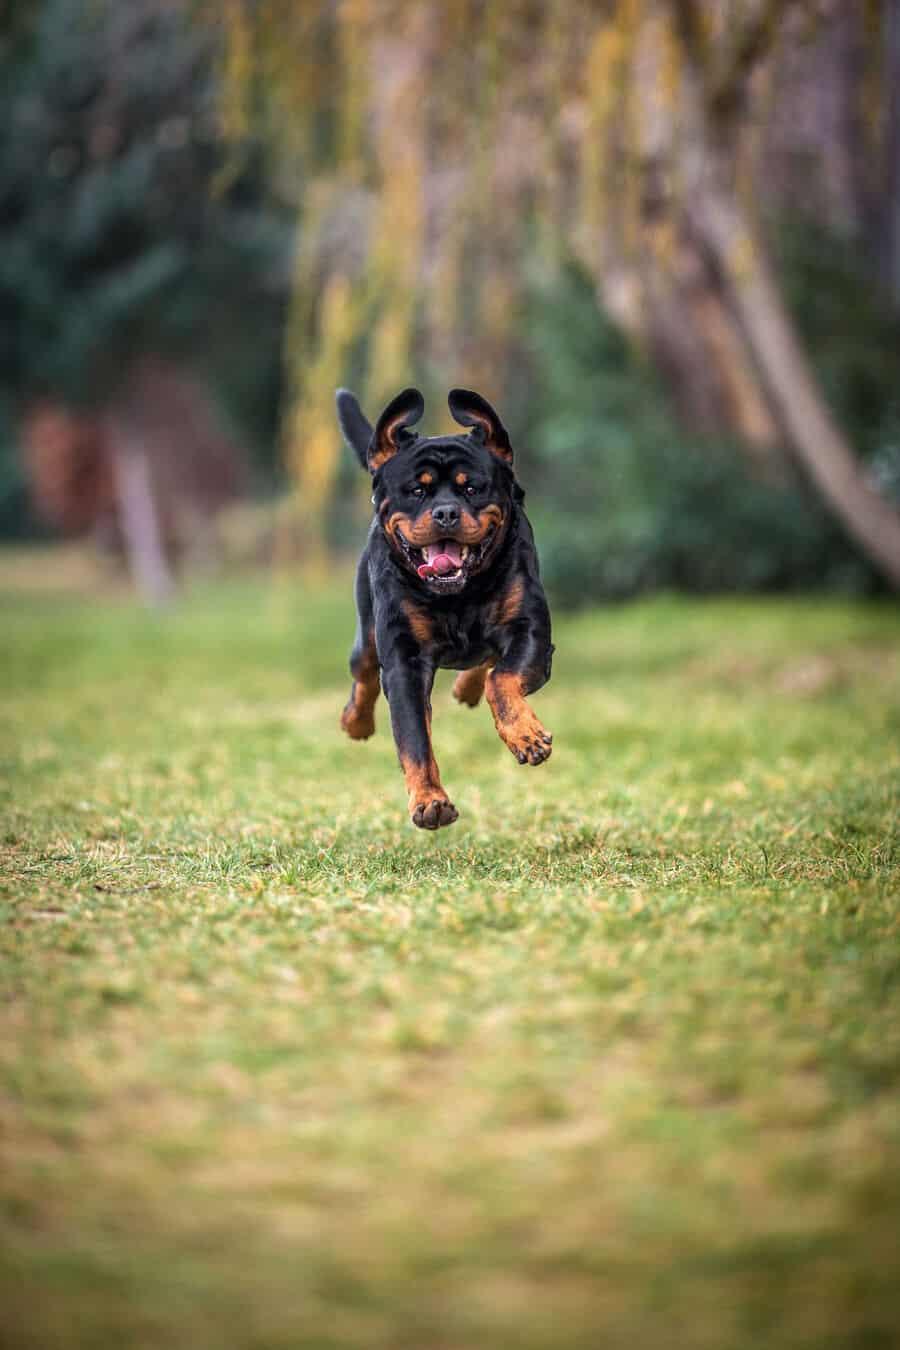 Can Rottweilers Run Long Distances?